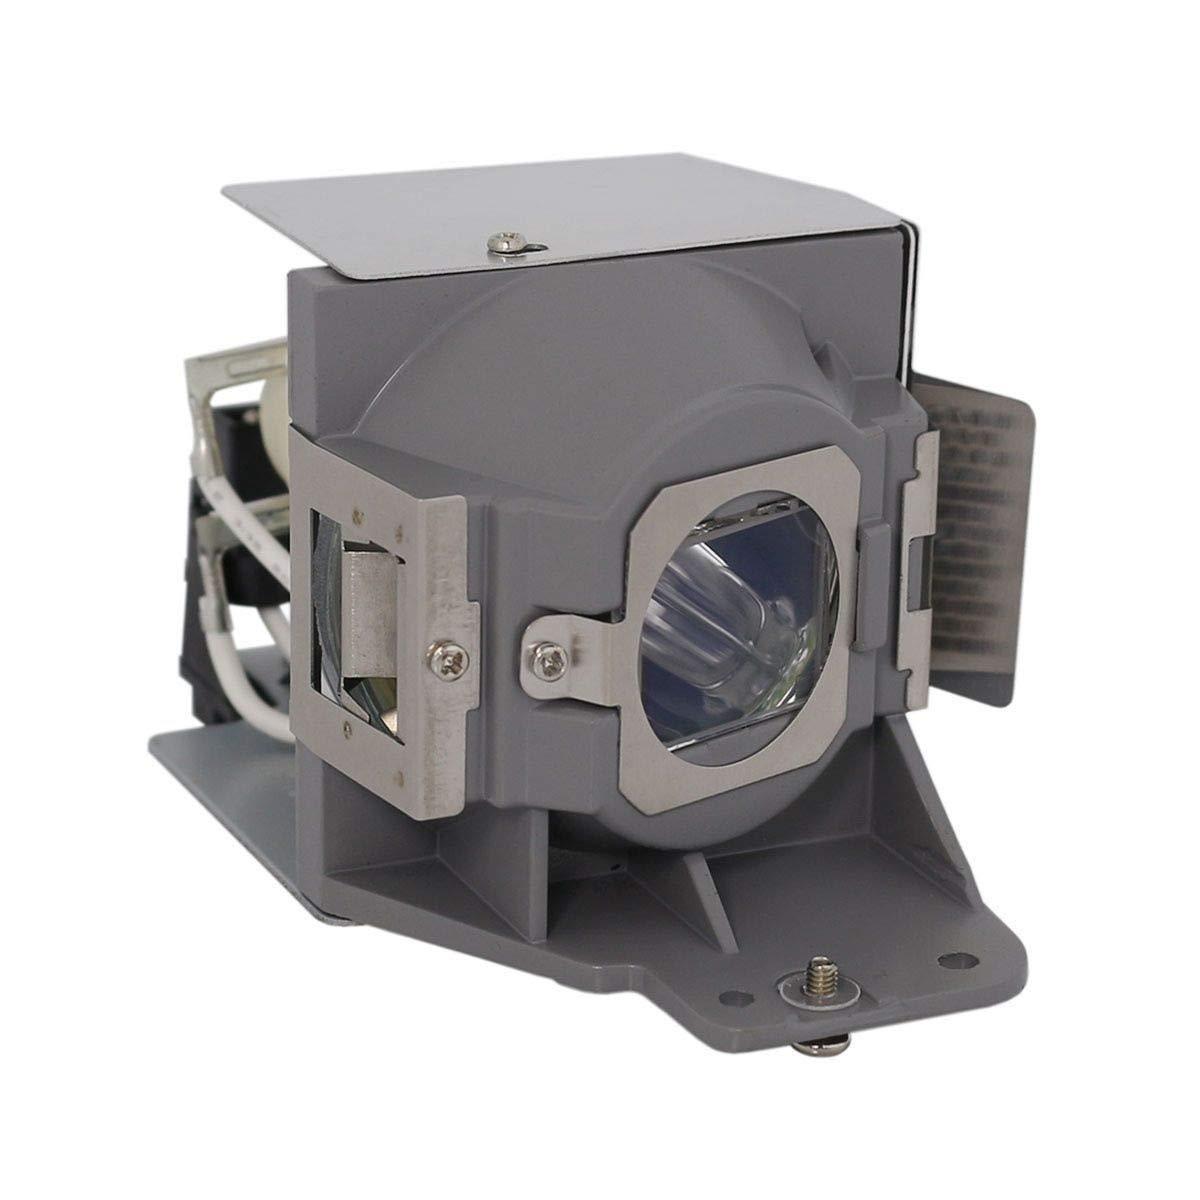 CTLAMP MC.JG211.00B プロフェッショナル プロジェクターランプ電球 ハウジング付き MC.JG211.00B Acer P5207 P5207B P5207i P5307WB P5307Wiに対応   B07PZ9WB6X